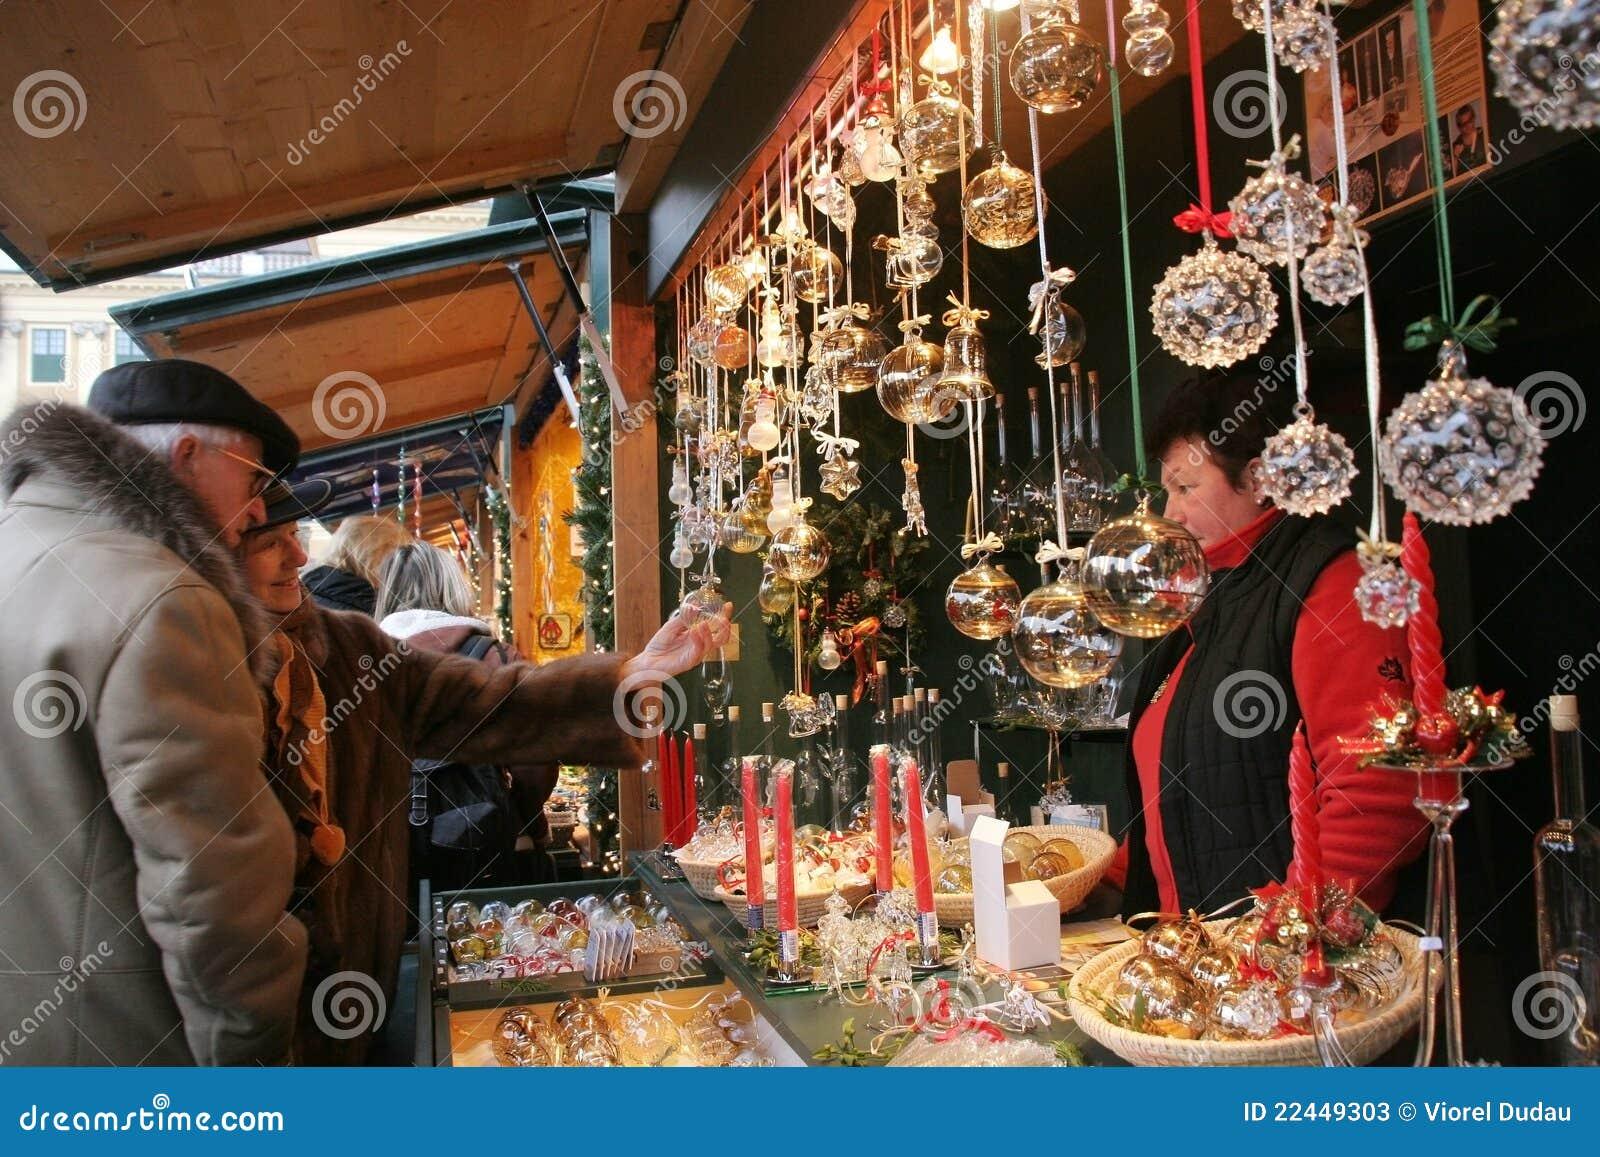 Christkindlmarkt Vienna Christmas Market Editorial Stock